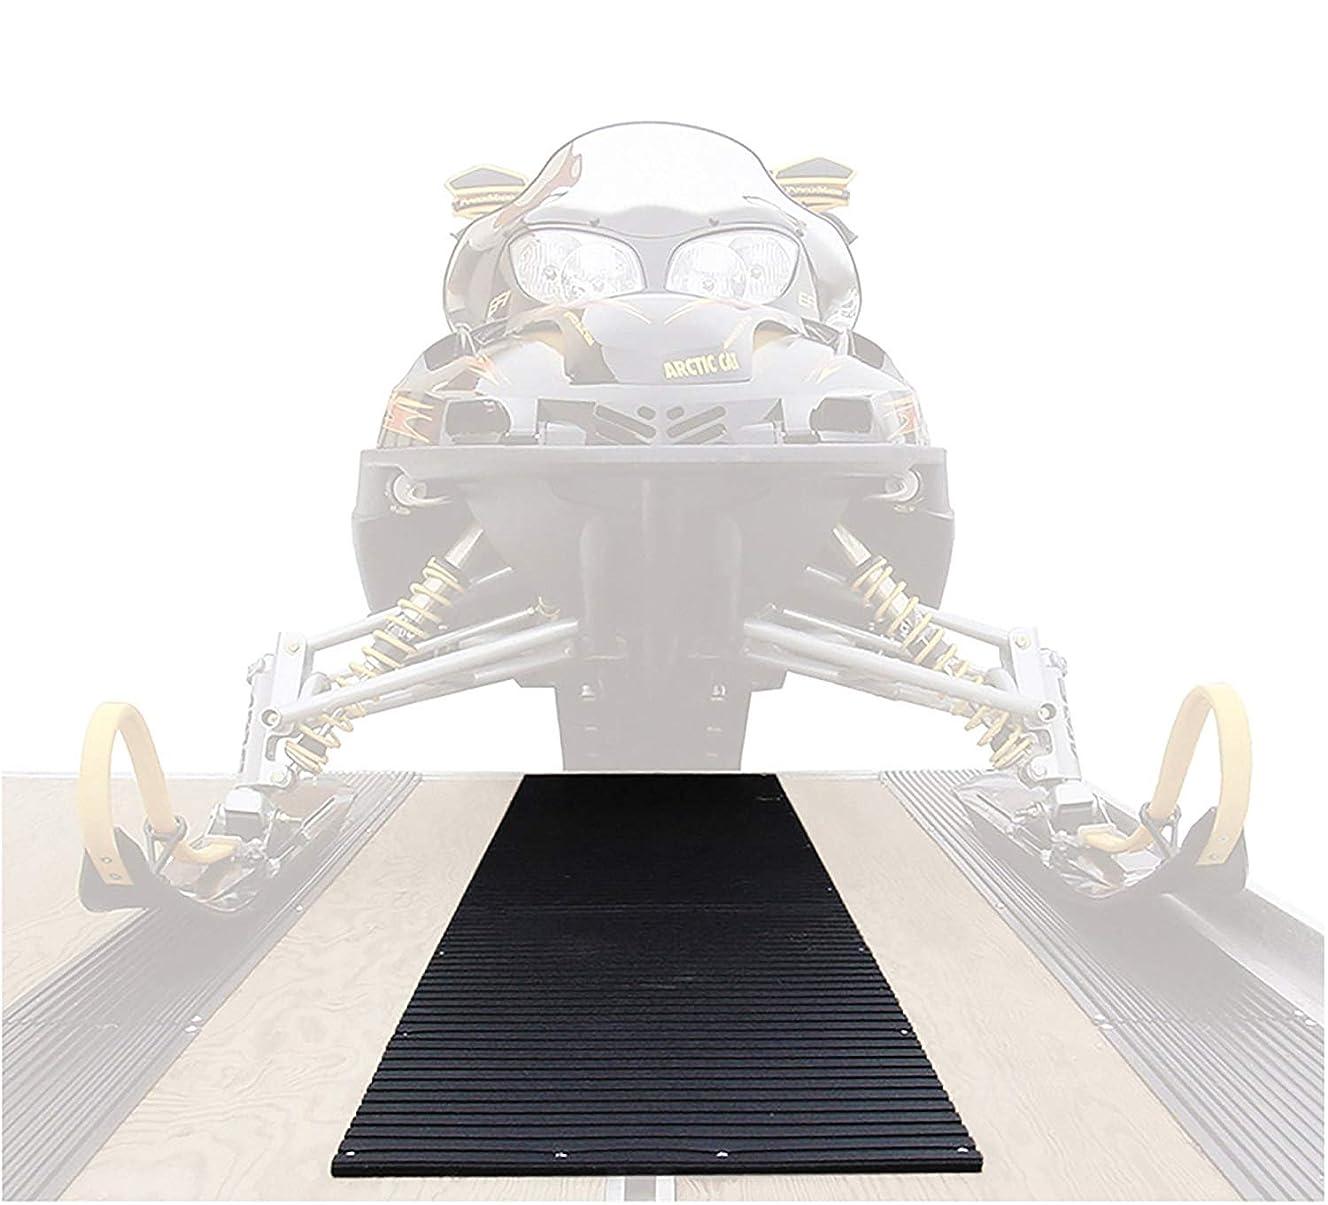 Raider Snowmobile Protection Trax Trailer Track Mat (54